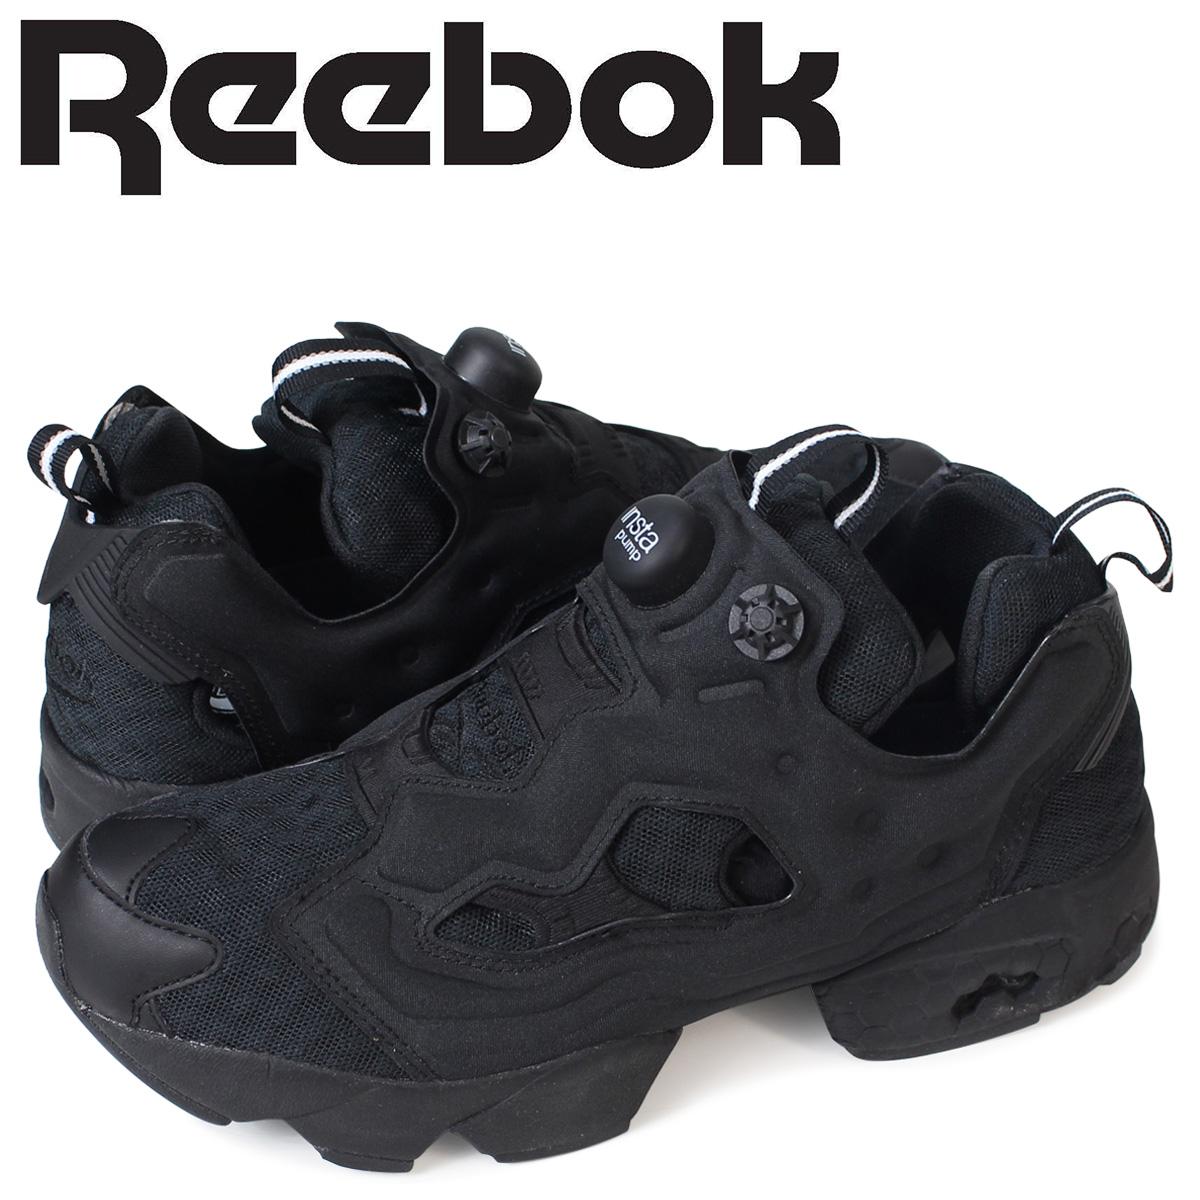 0c1c4470882 Whats up Sports: リーボックポンプフューリースニーカー Reebok INSTA PUMP FURY OG CC BS6050 men  gap Dis shoes black [load planned Shinnyu load in reservation ...